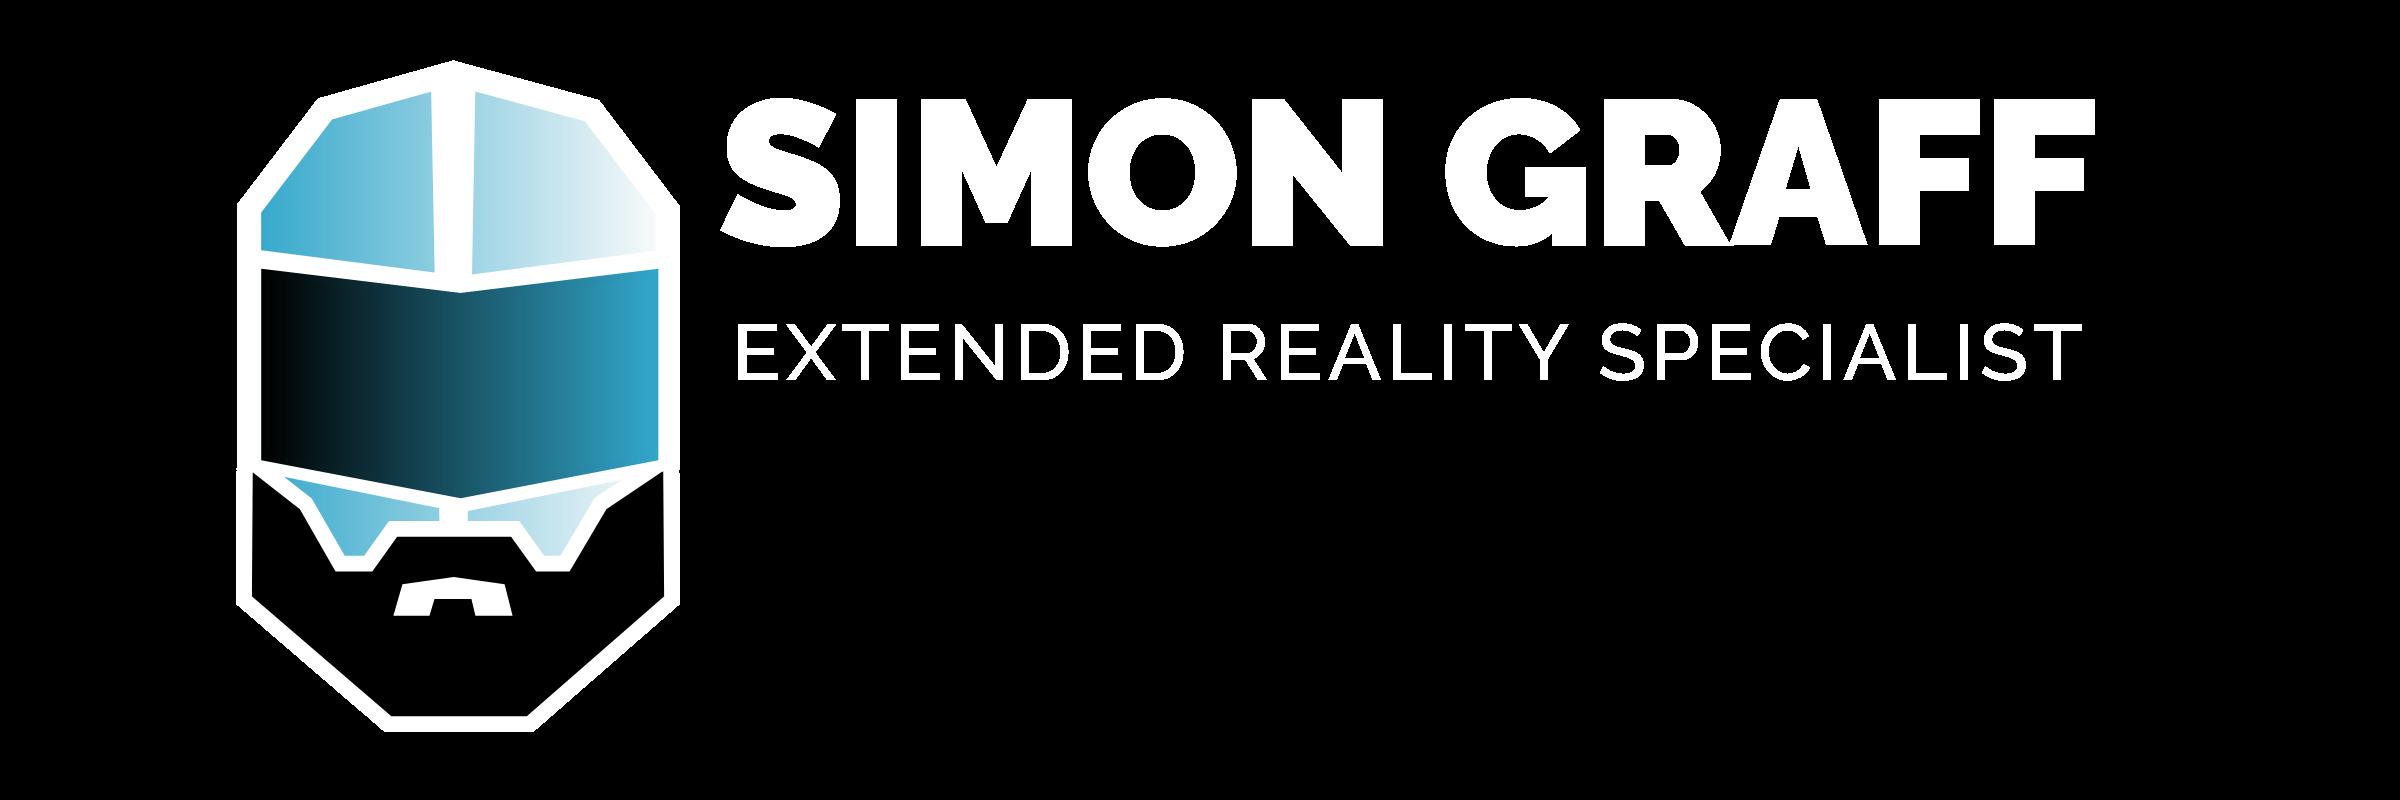 SIMON GRAFF